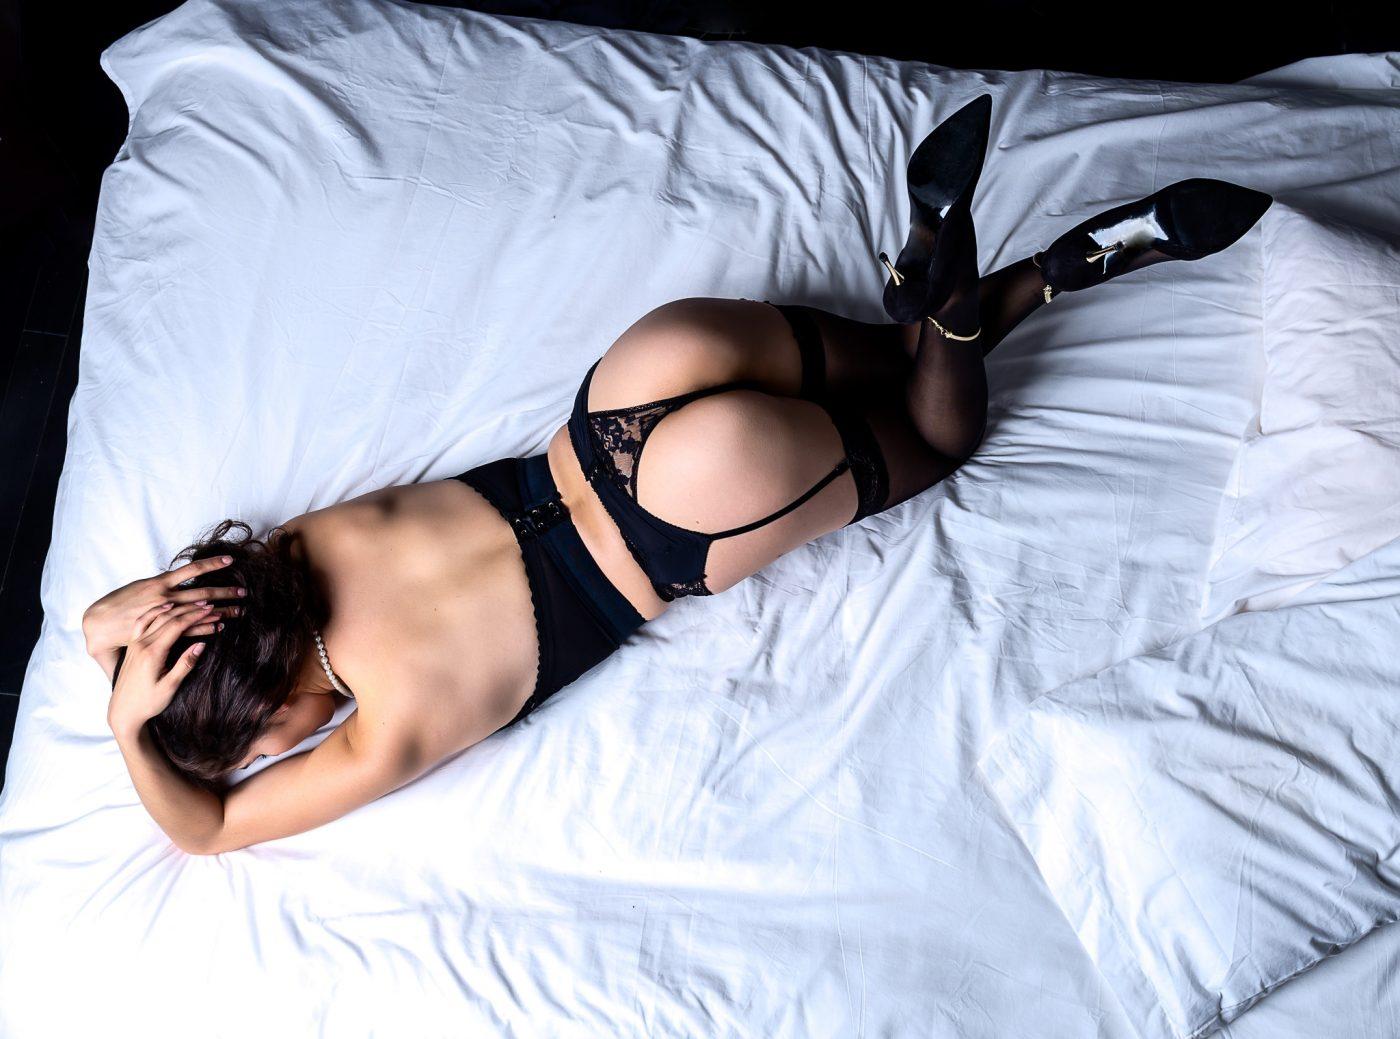 Houston Heights Boudoir Photography Professional Sensual Photographs like this sexy image of Maya